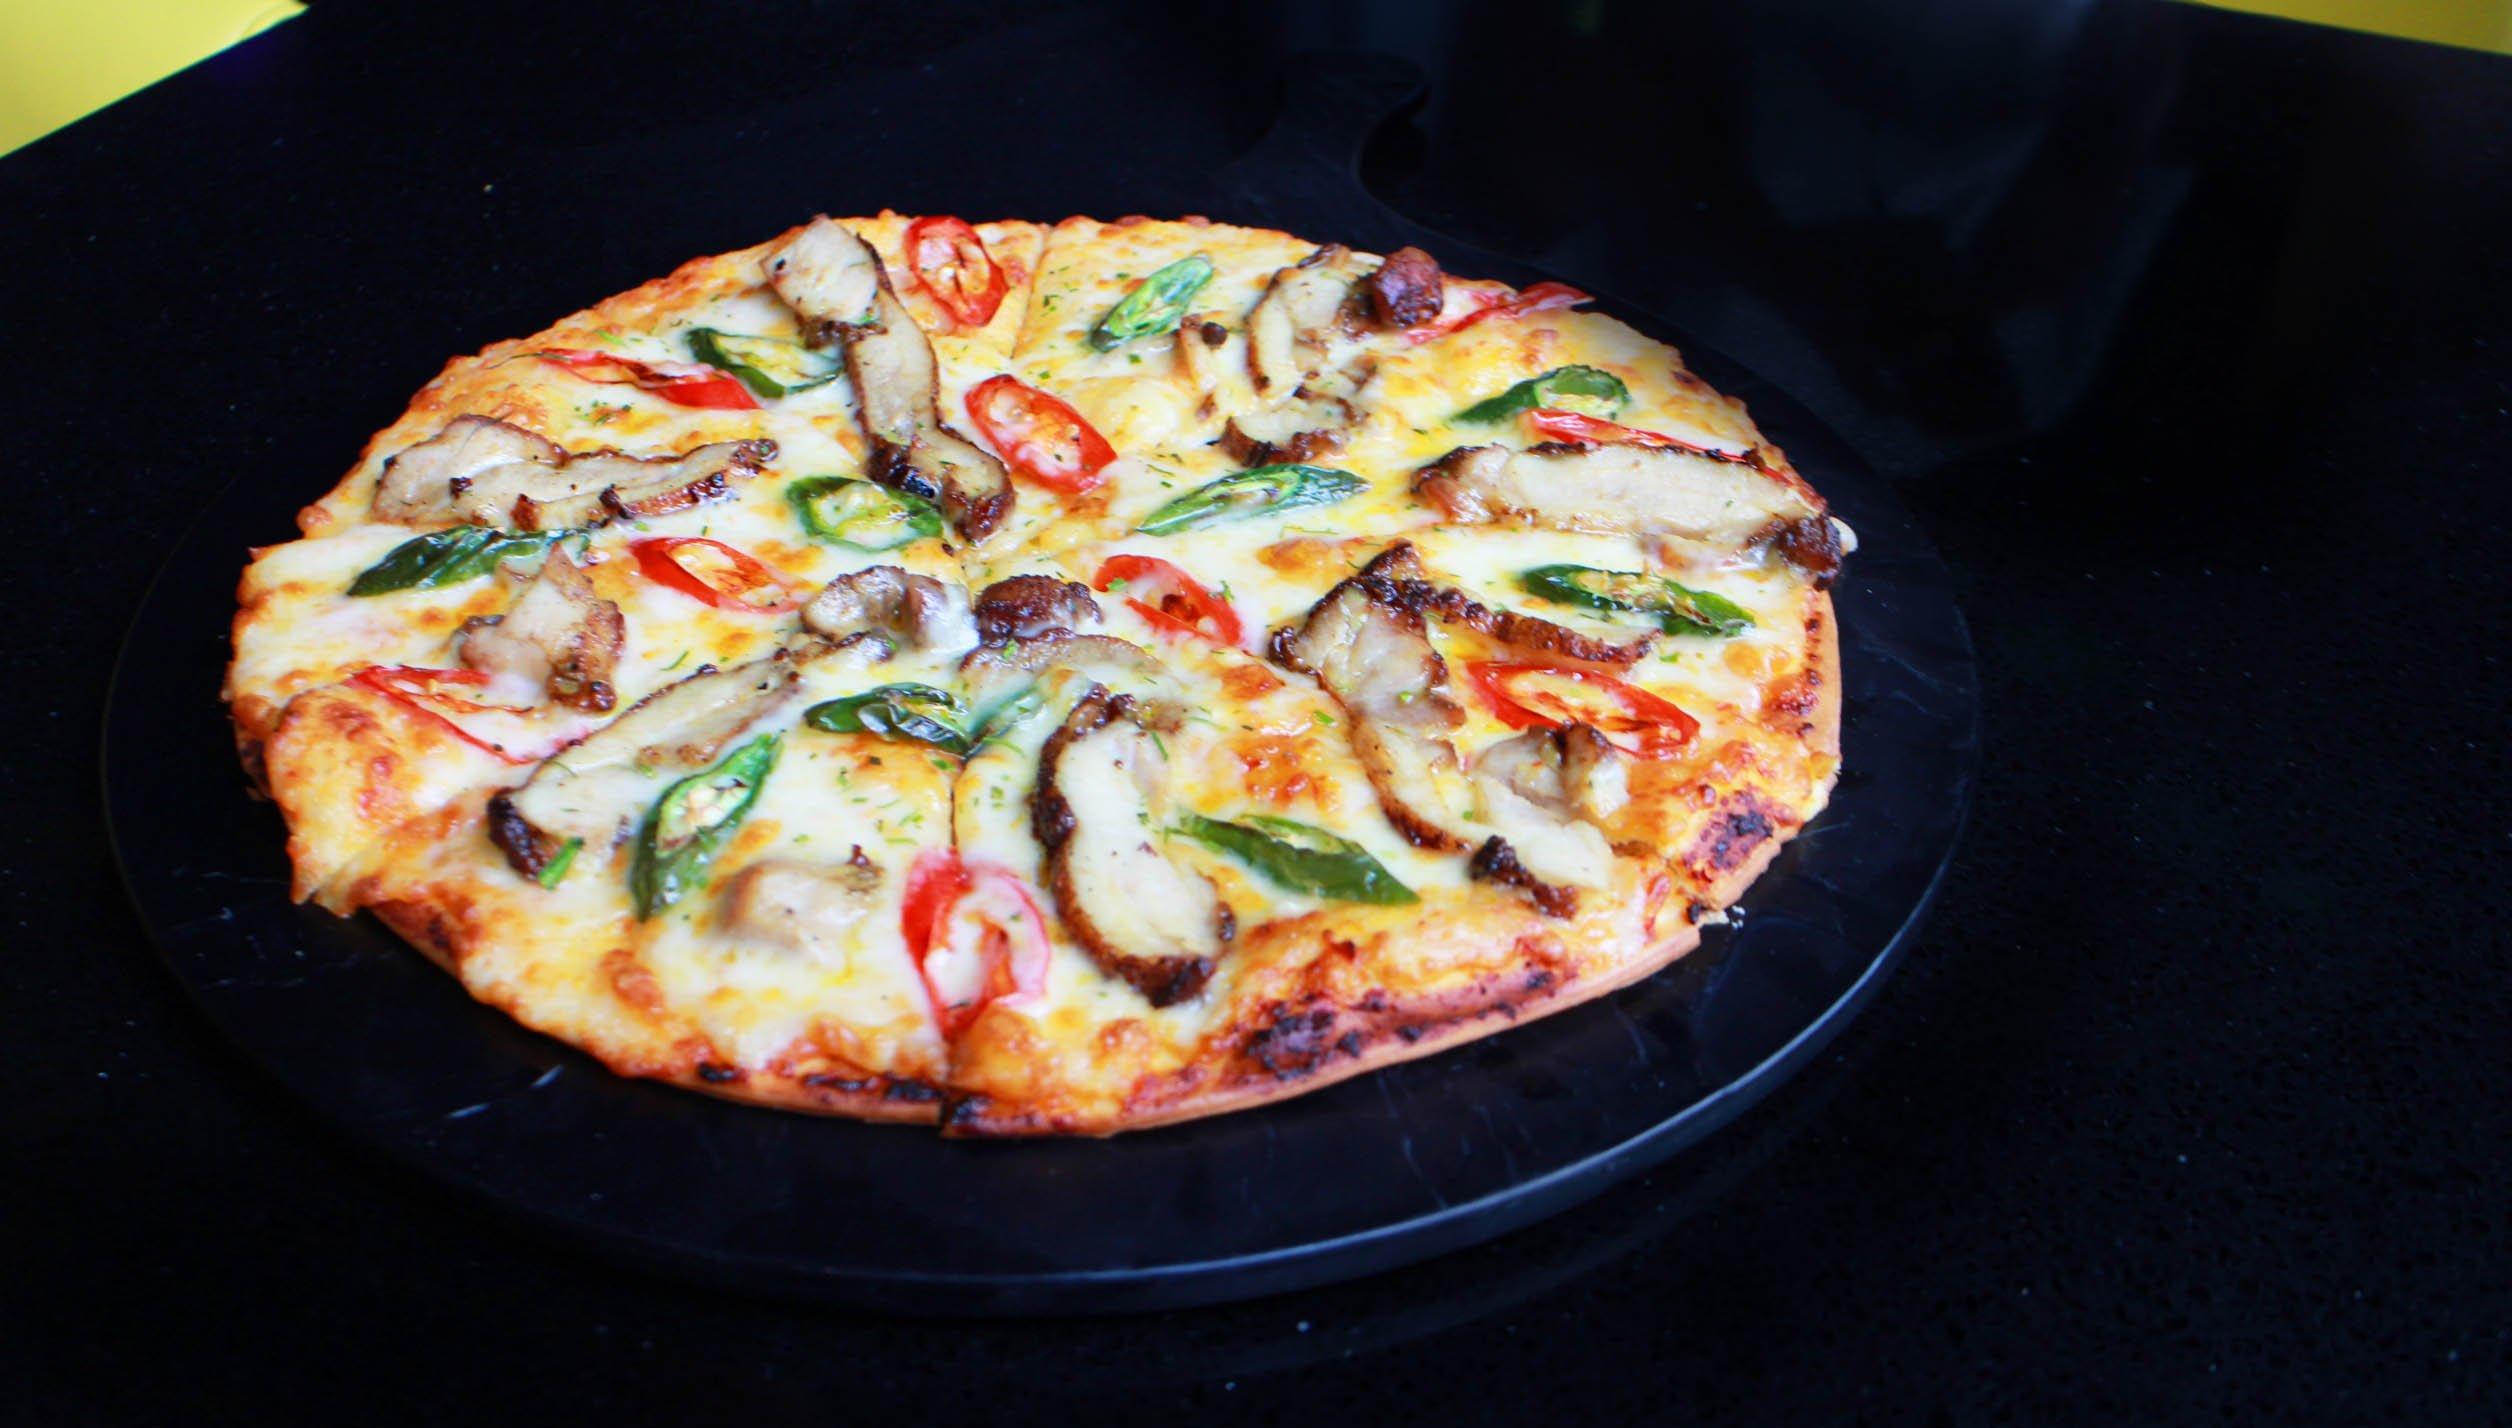 Signature Spicy Chicken Balado pizza - Justsaying.ASIA